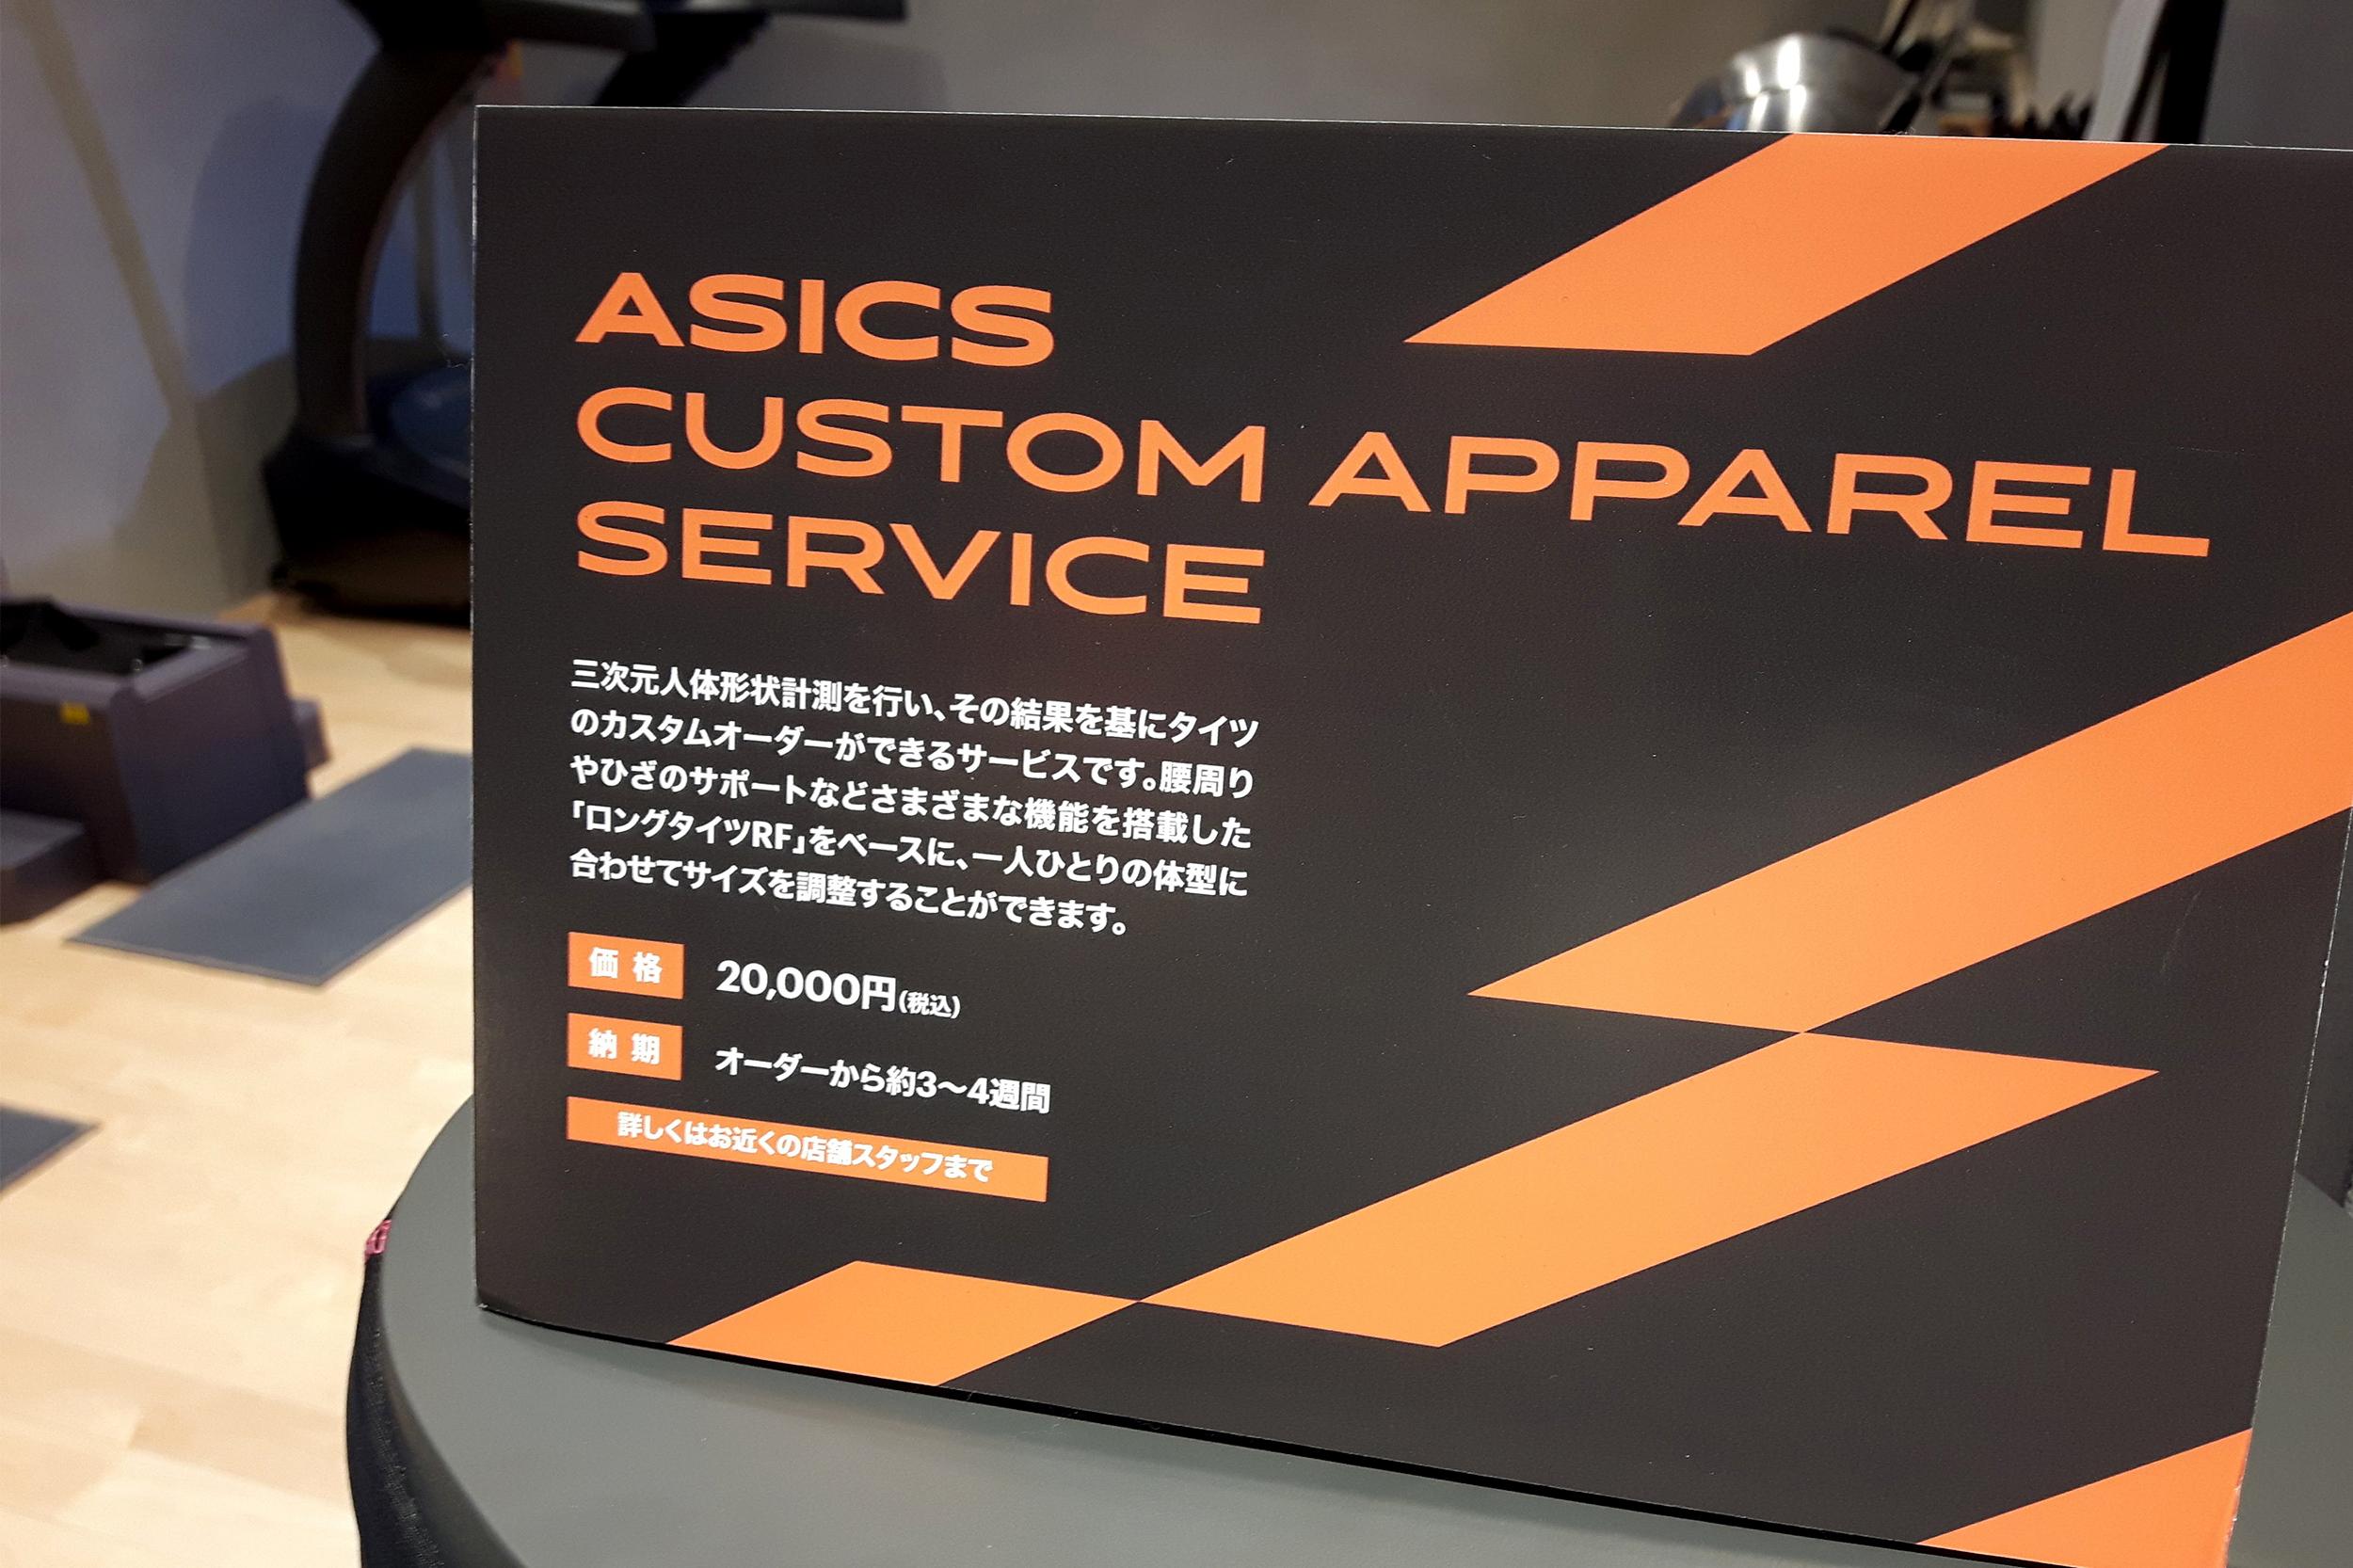 asics_05 copy.jpg